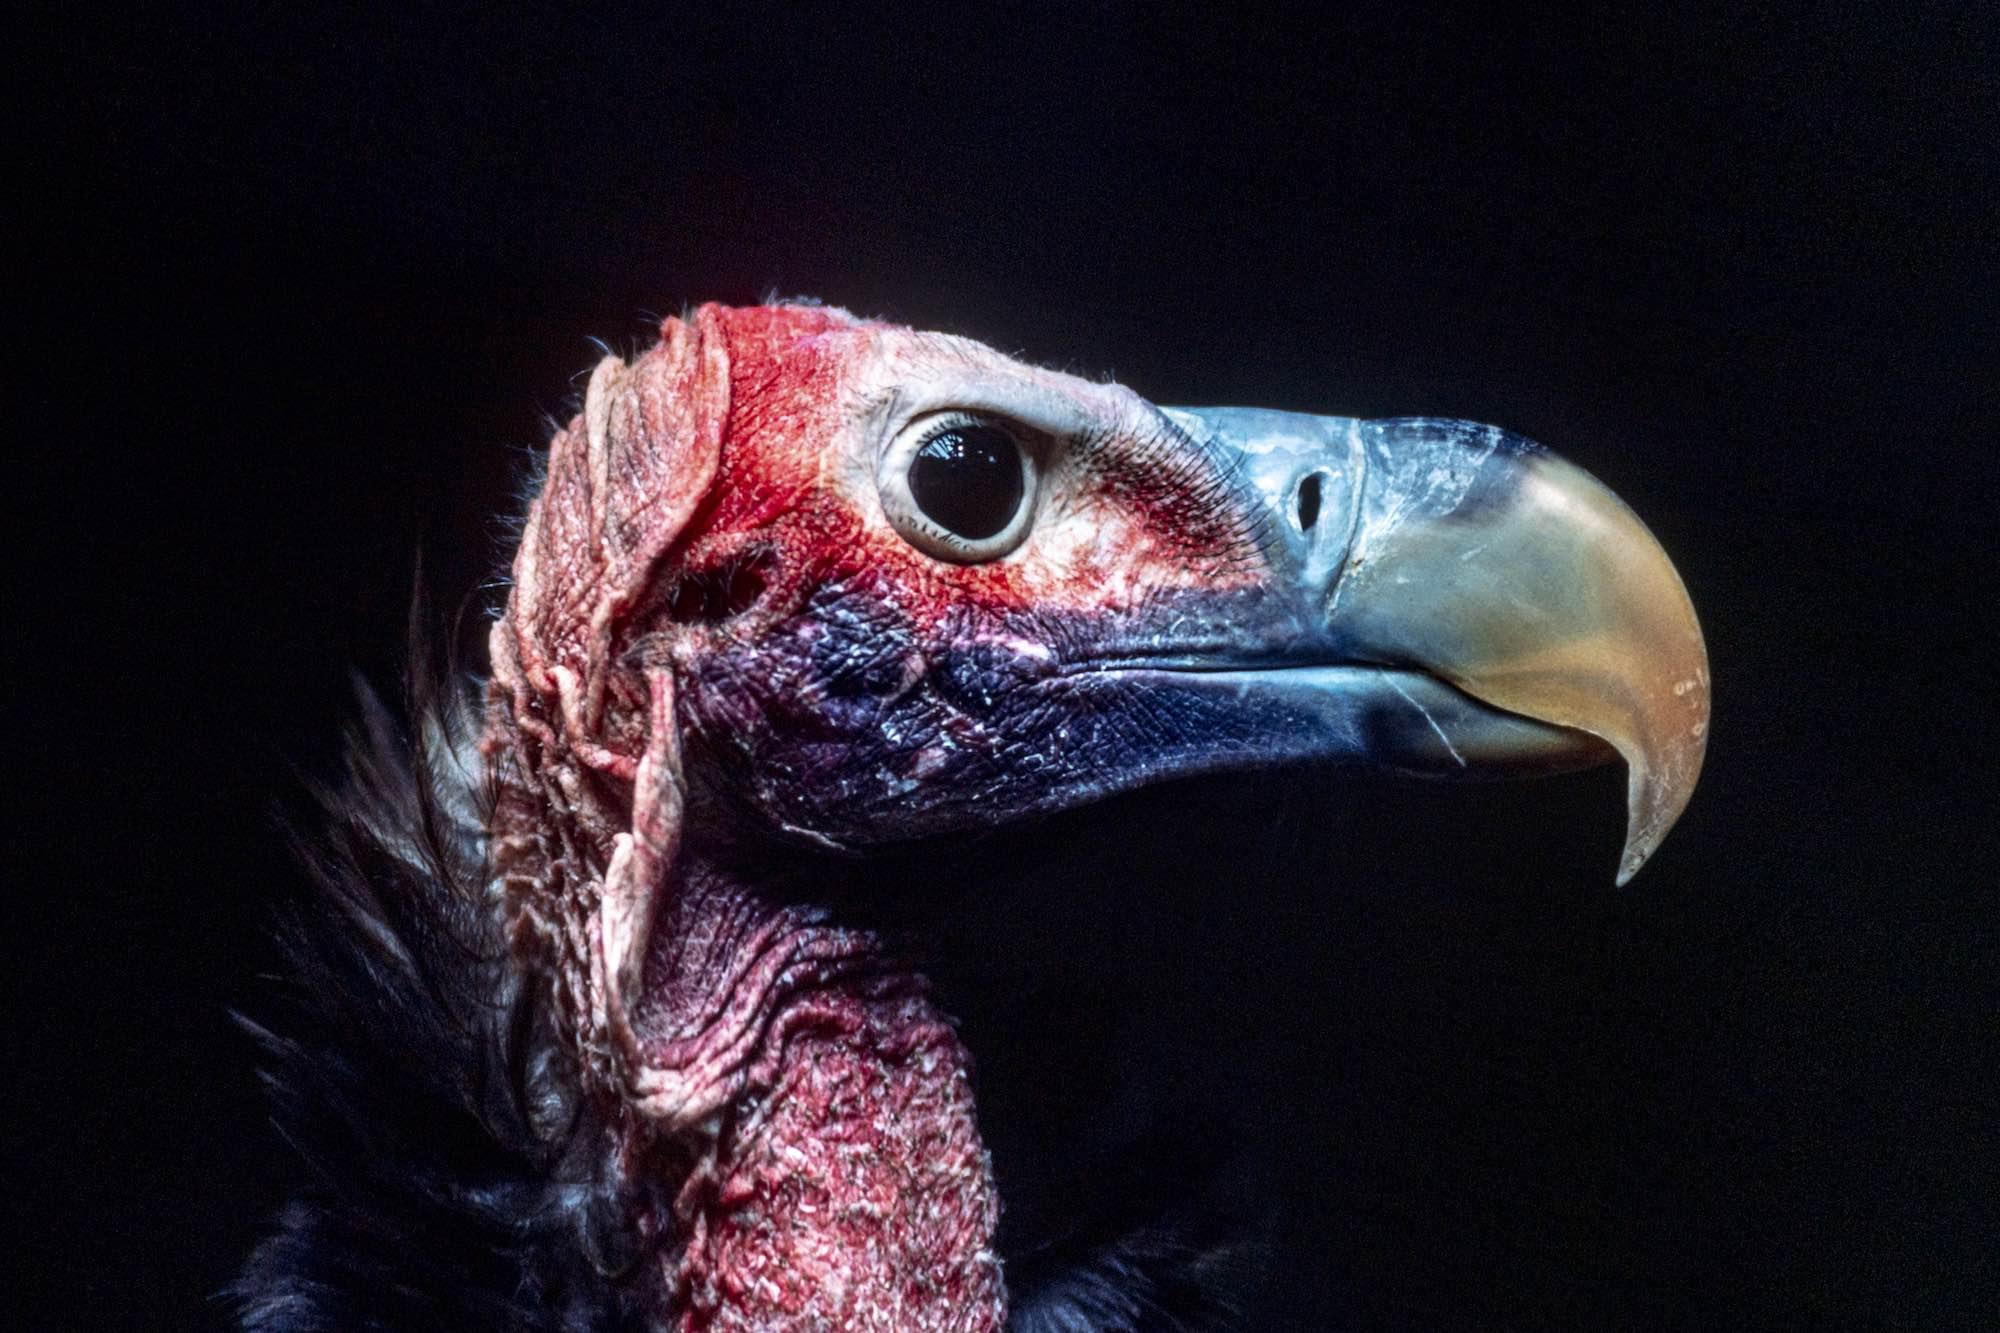 Vulture Oricou - Yann Arthus-Bertrand